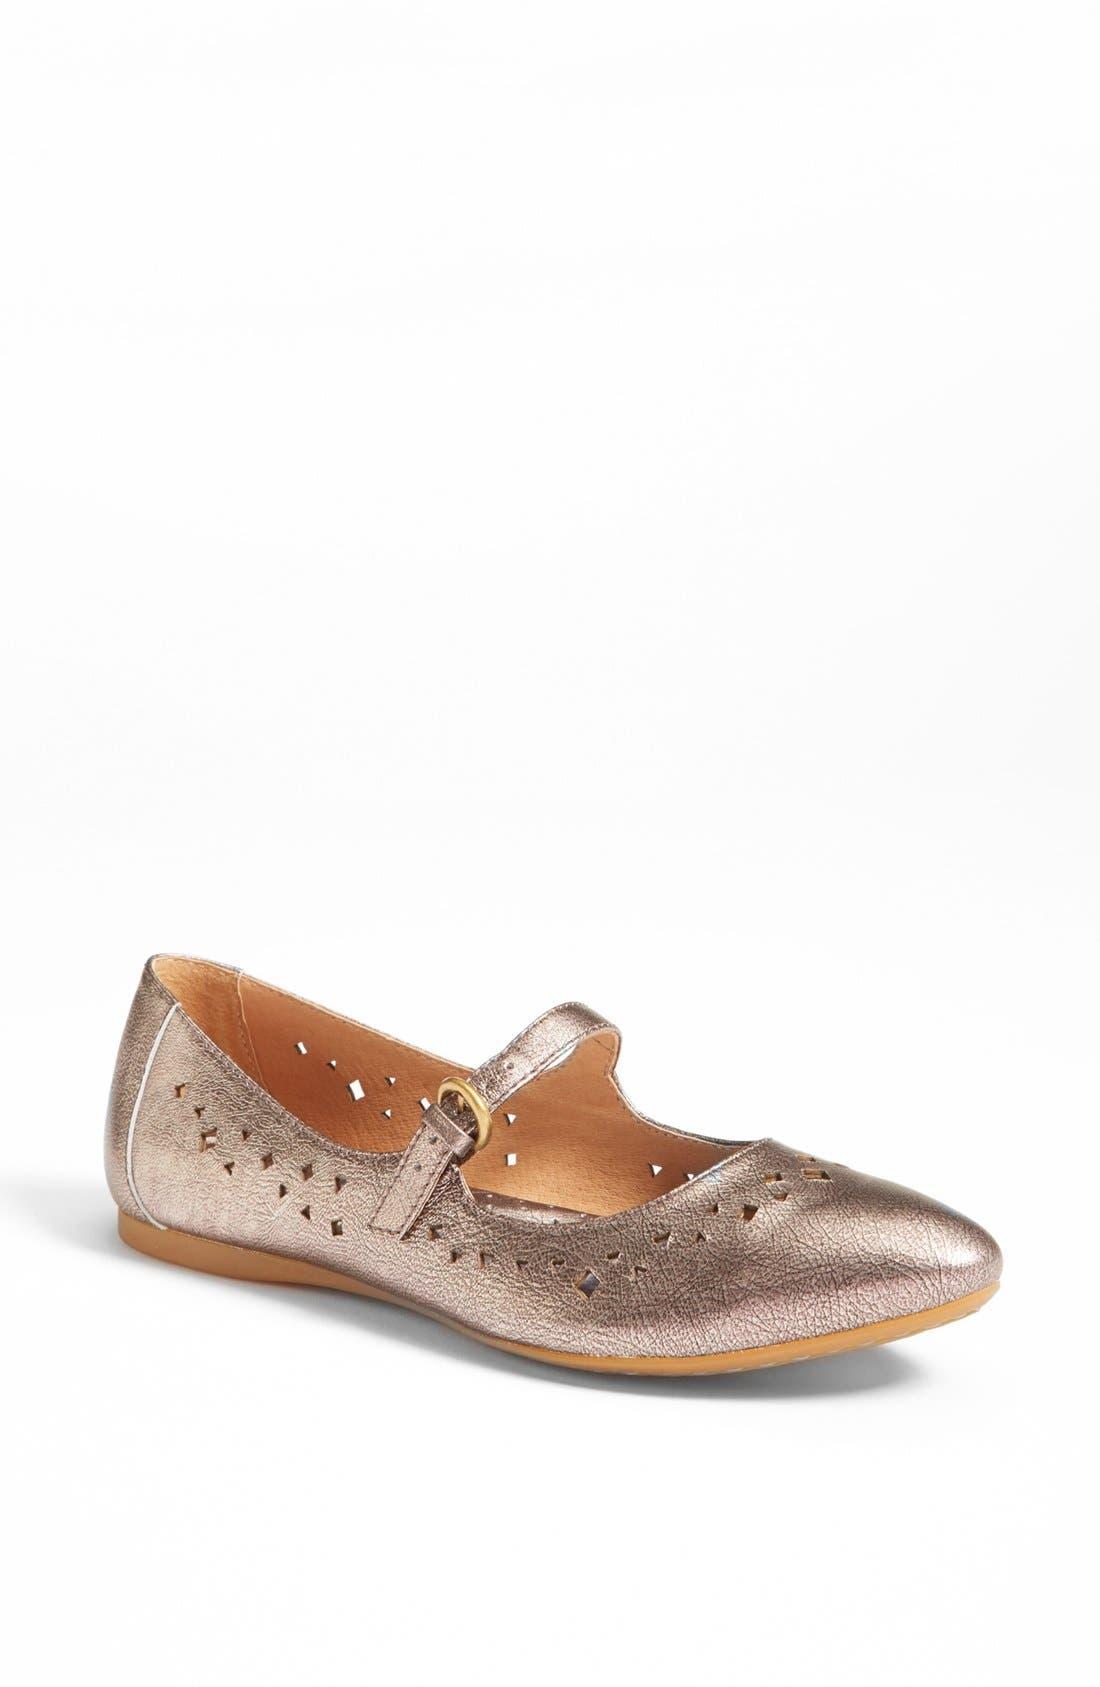 Main Image - Børn 'Linney' Leather Flat